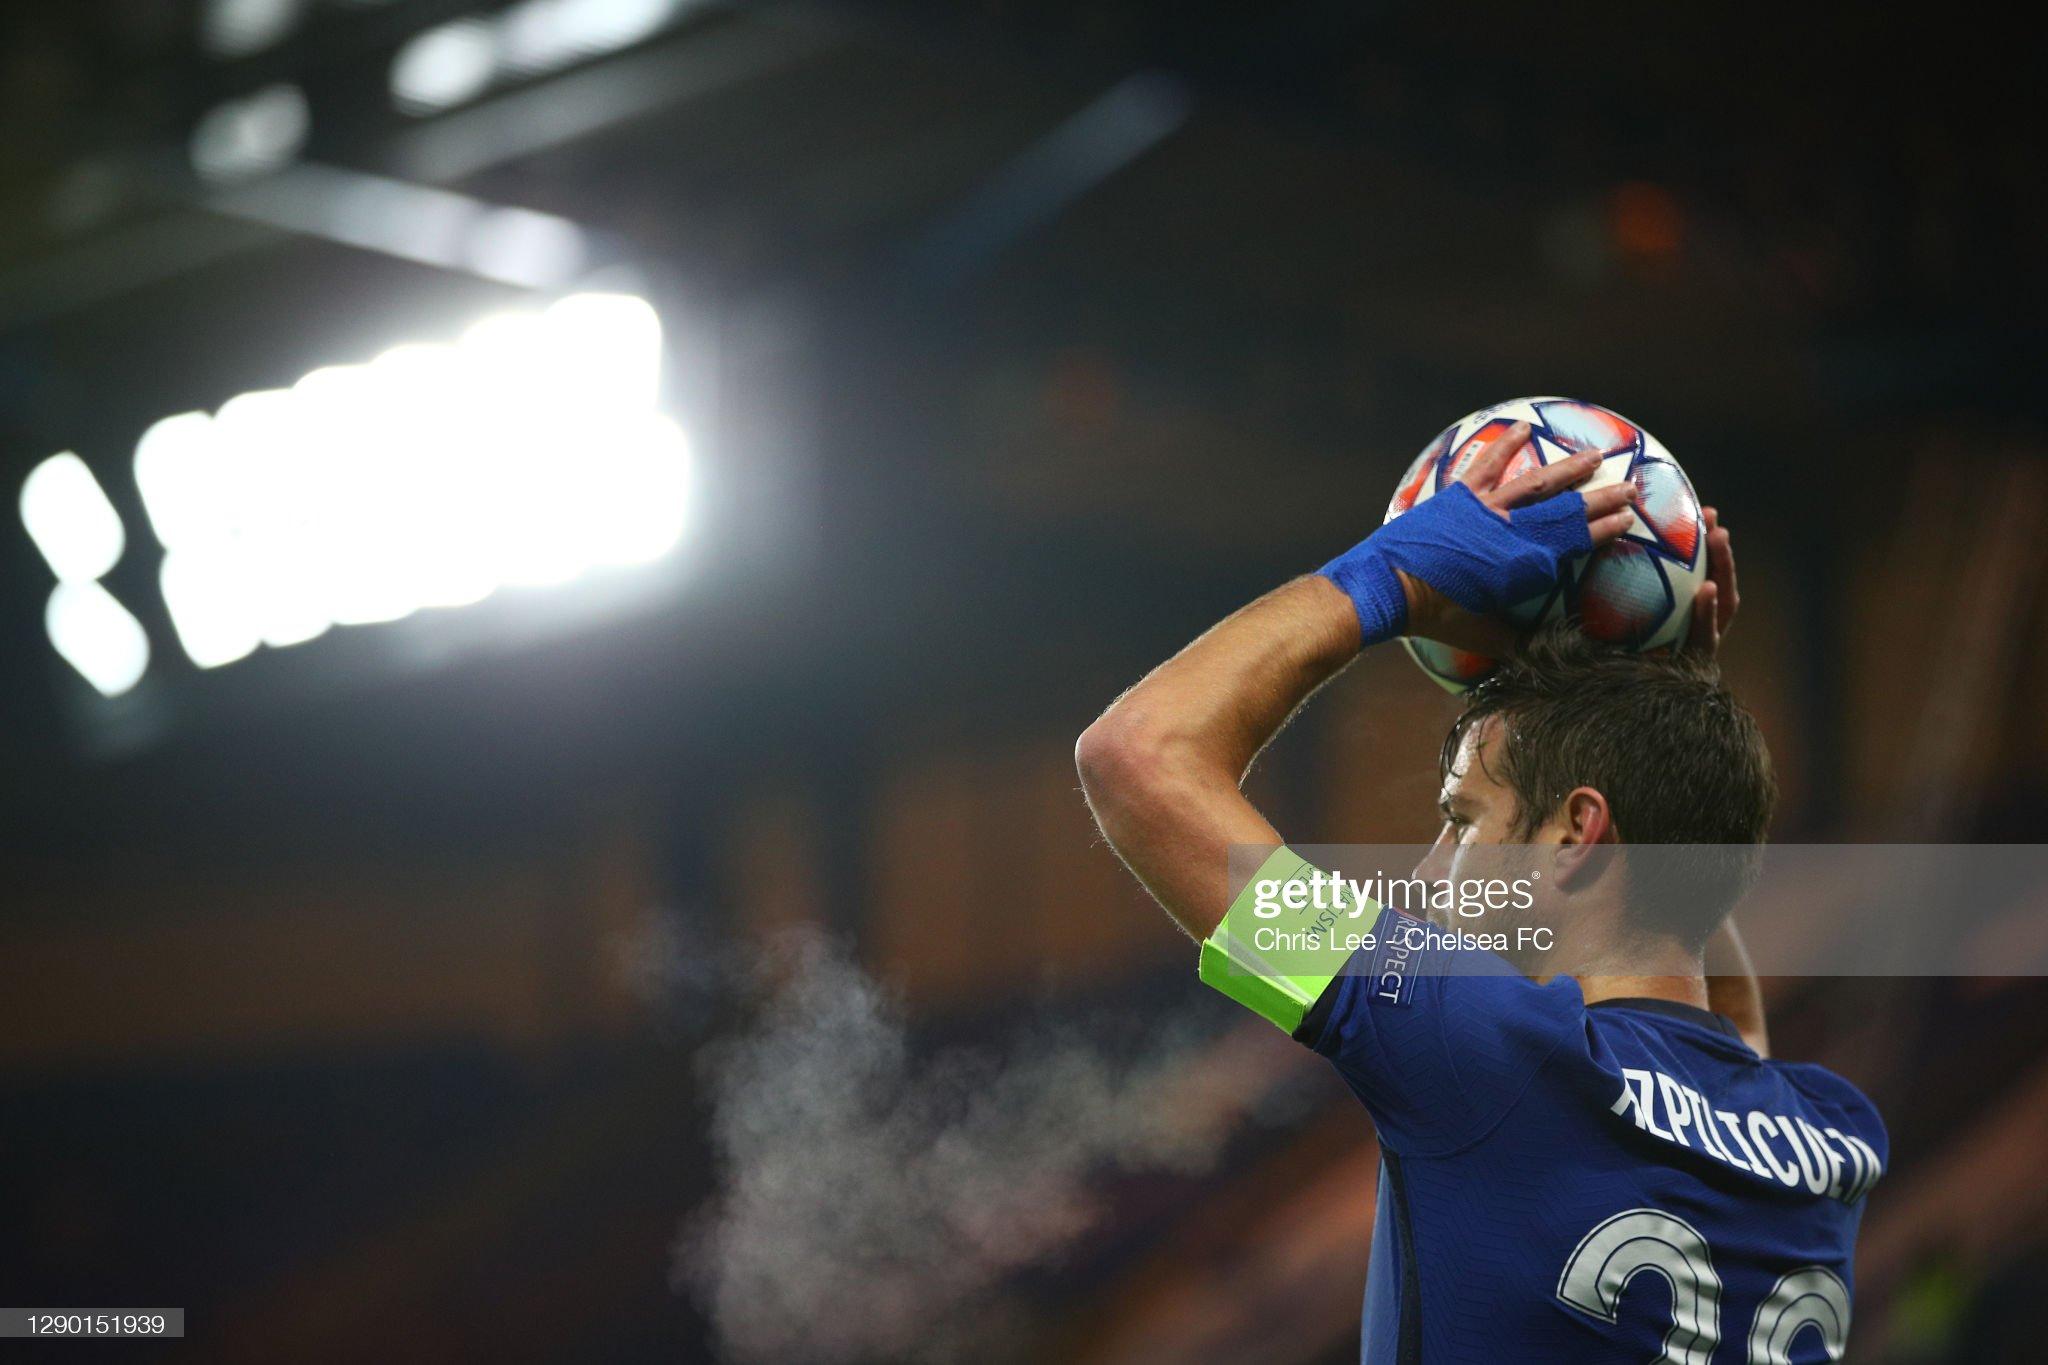 Chelsea FC v FC Krasnodar: Group E - UEFA Champions League : News Photo